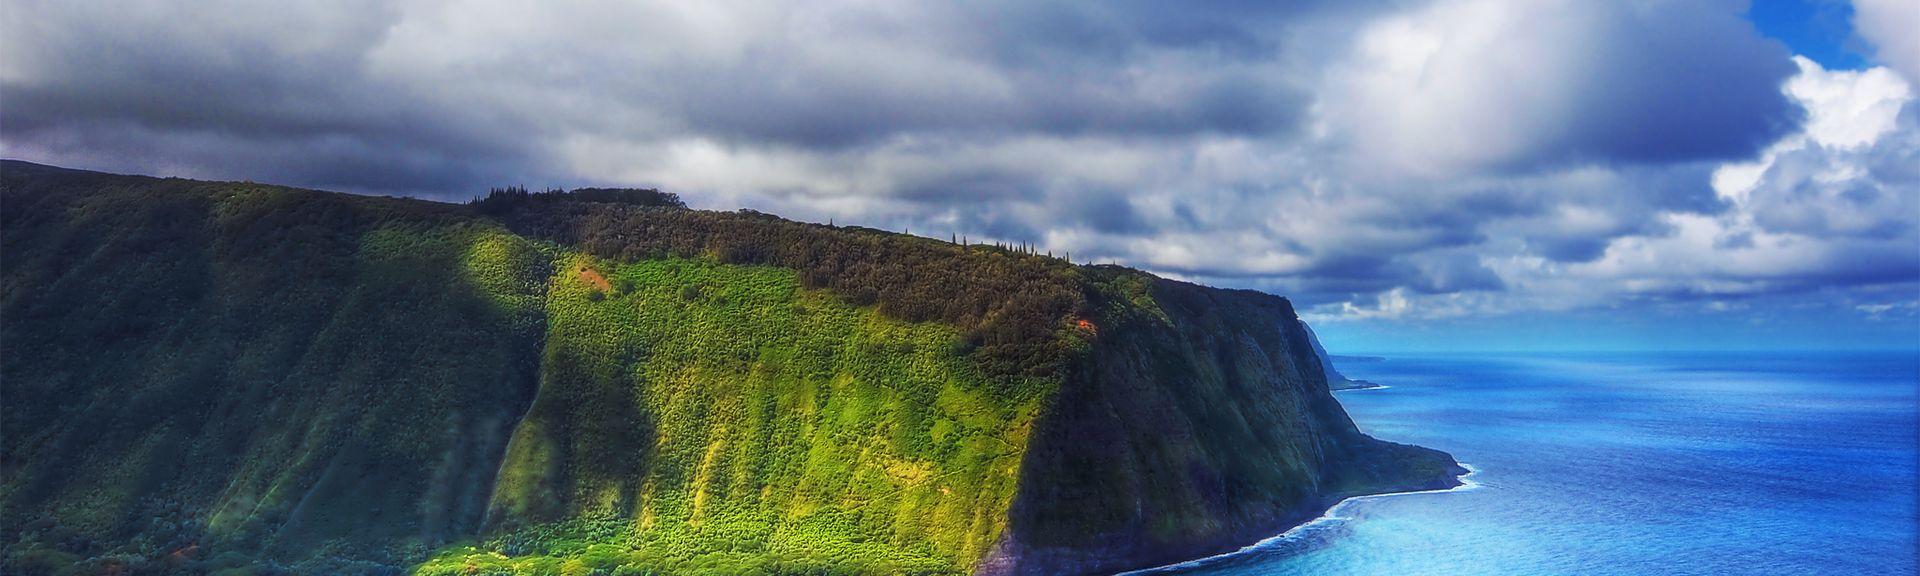 Akaka Falls, HI, USA